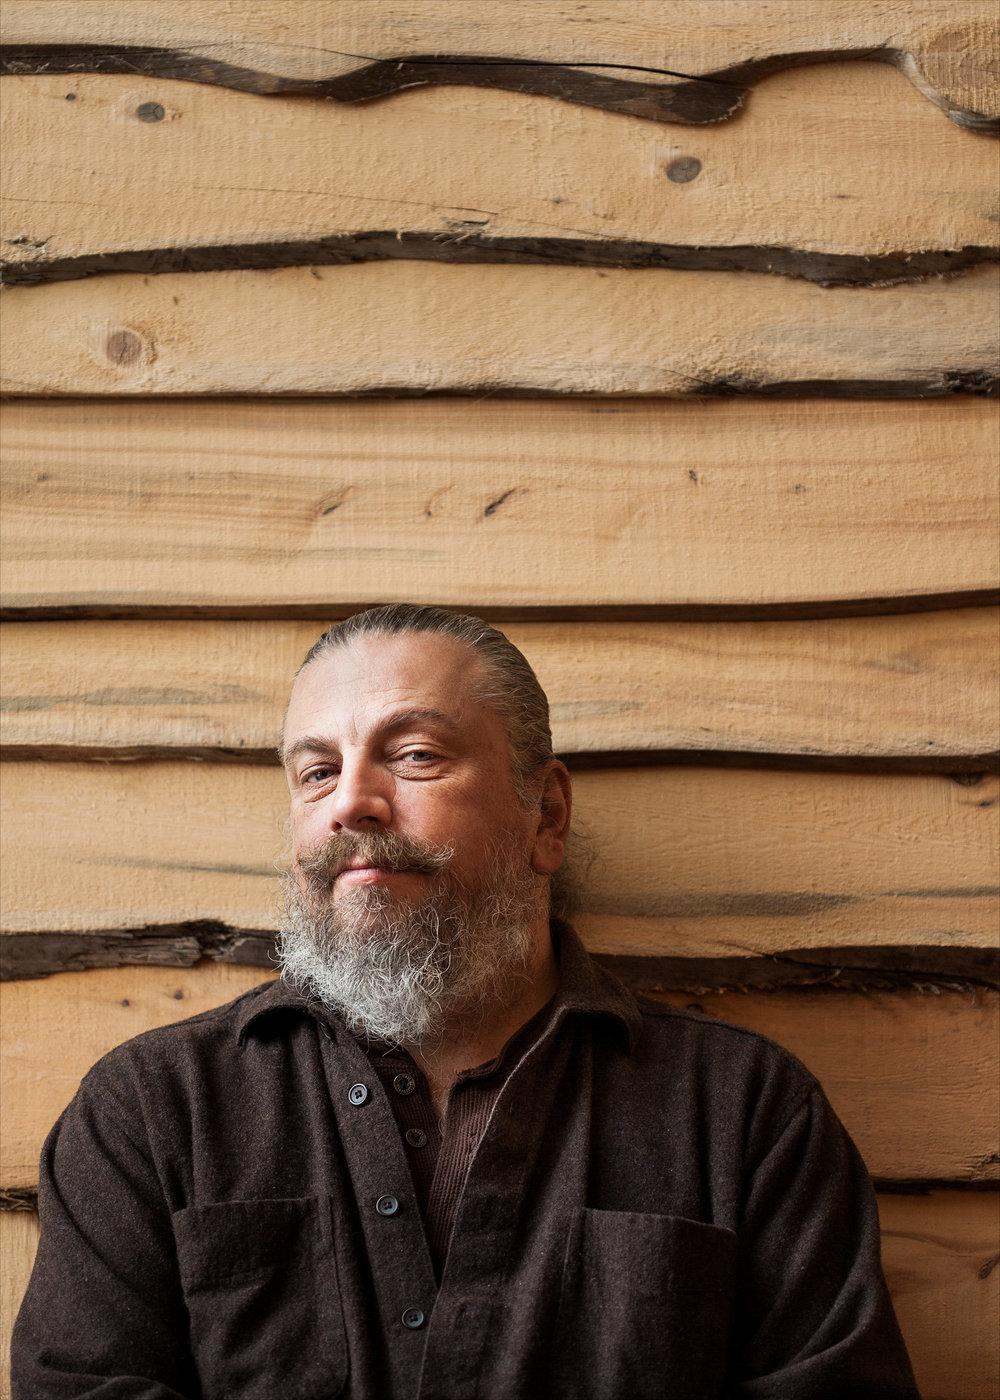 Bob Rasmussen, director of the Duwamish Longhouse